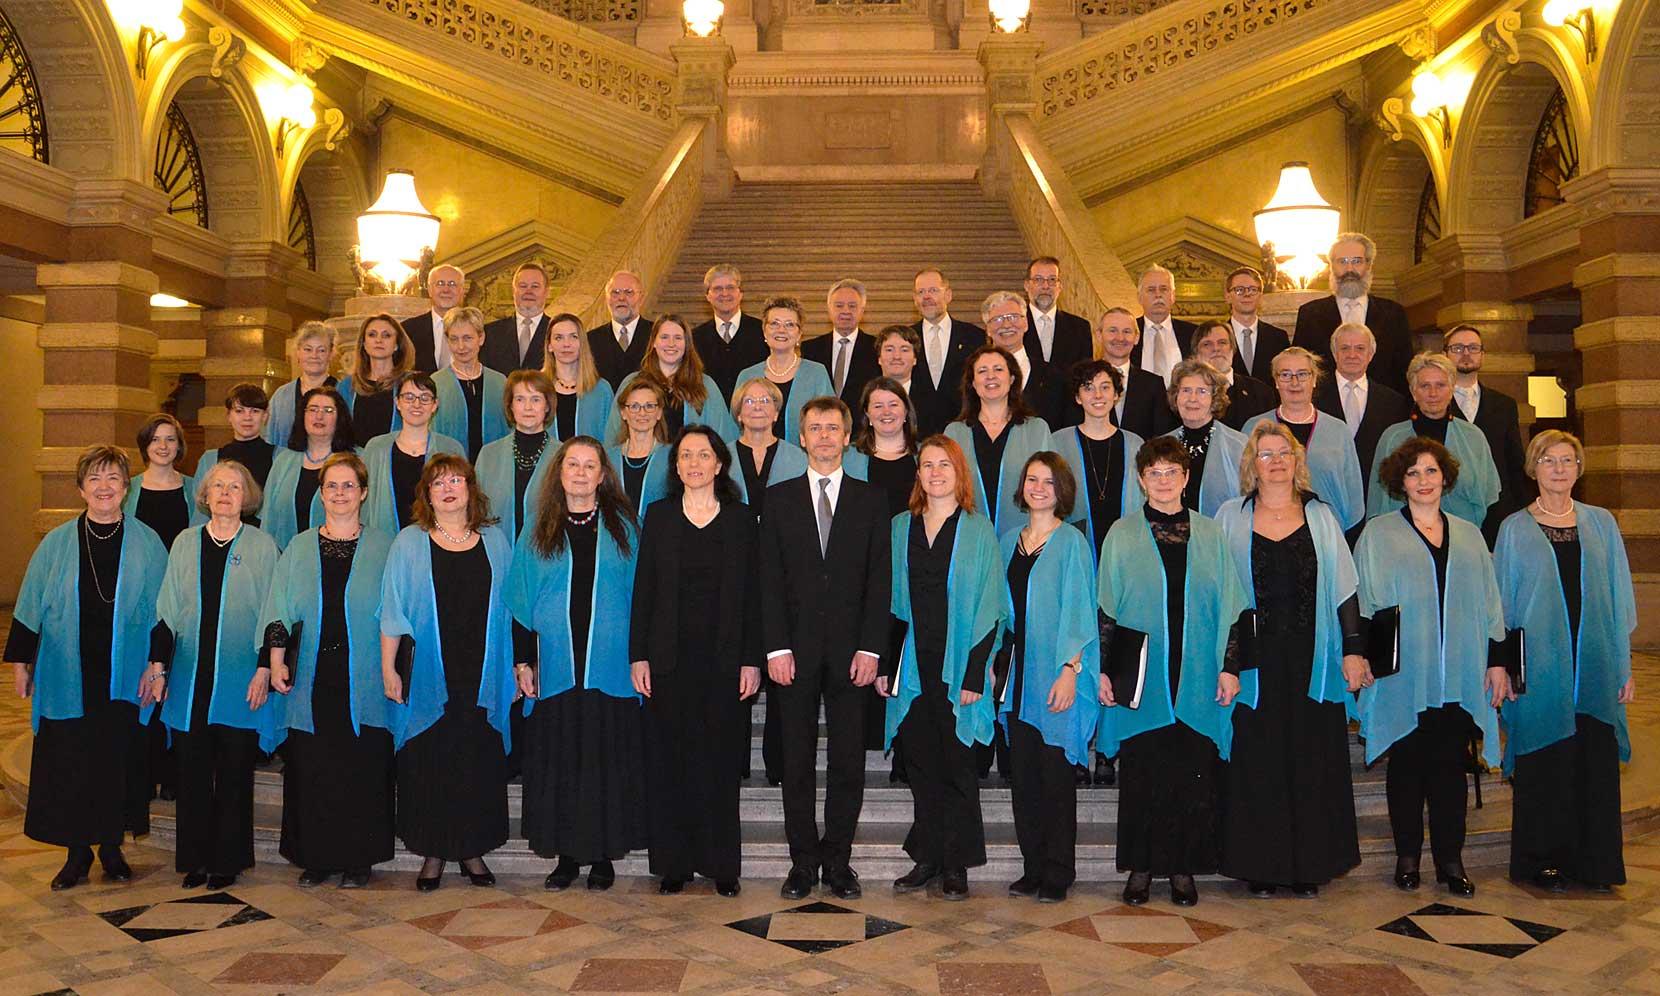 Chorvereinigung Schola Cantorum